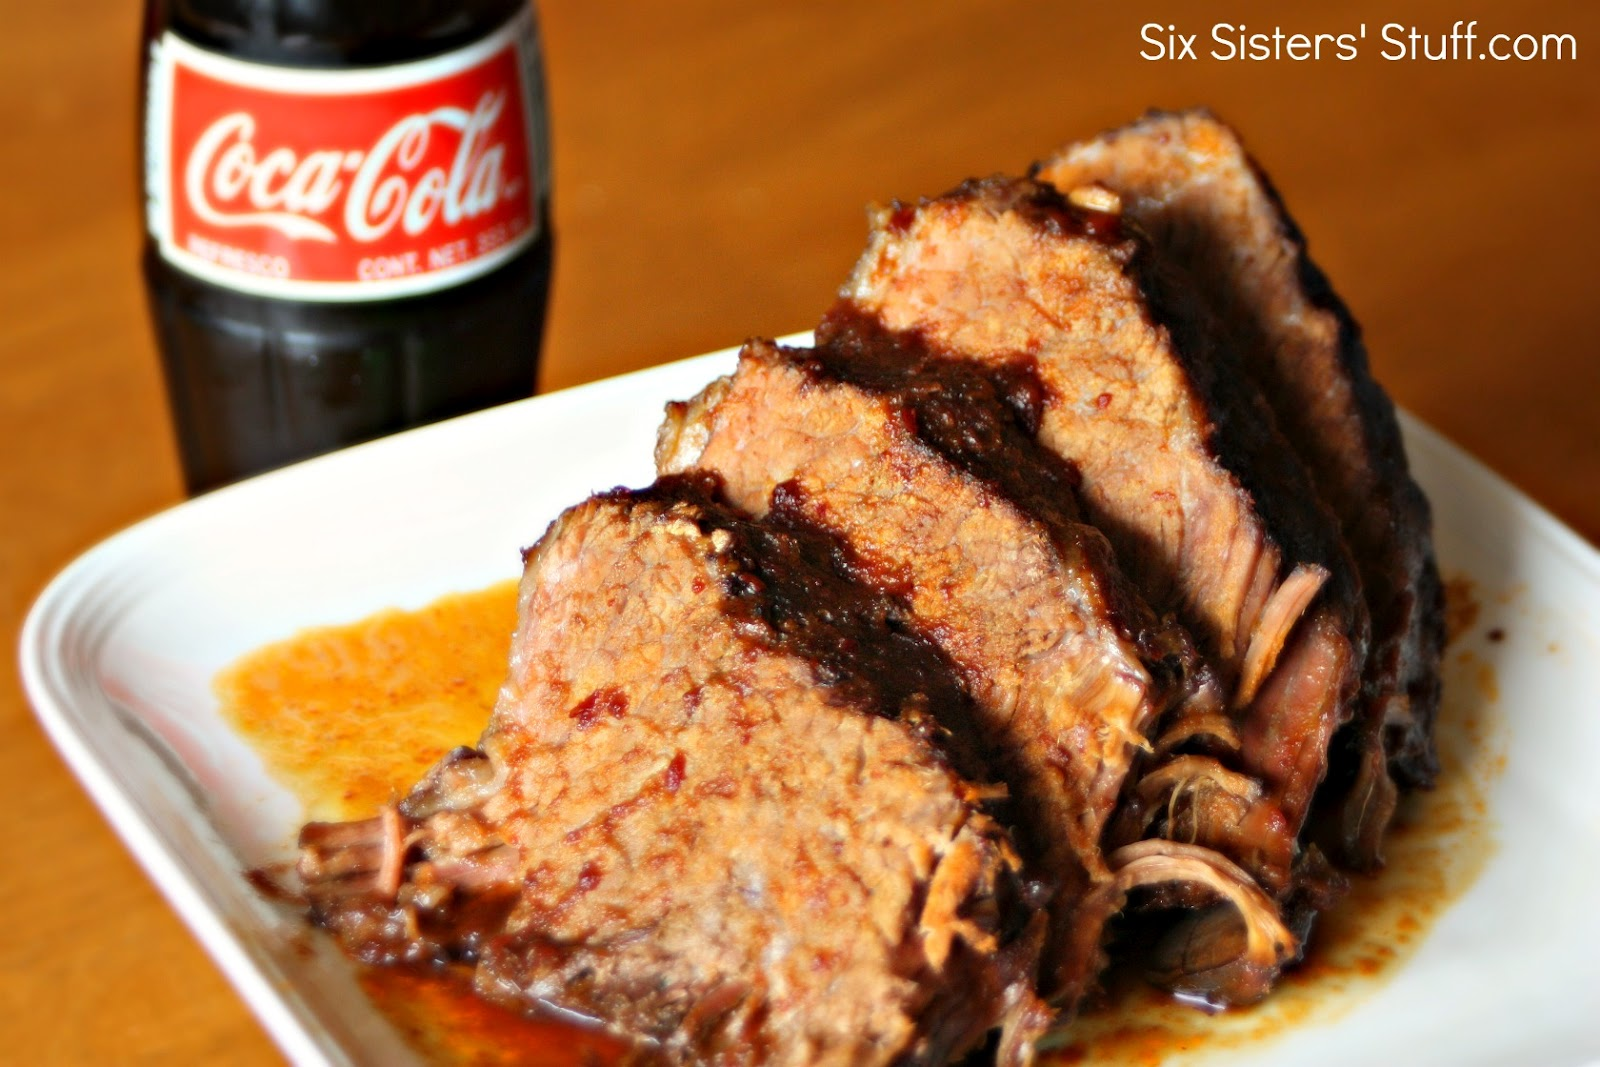 Pork roast recipe with cola